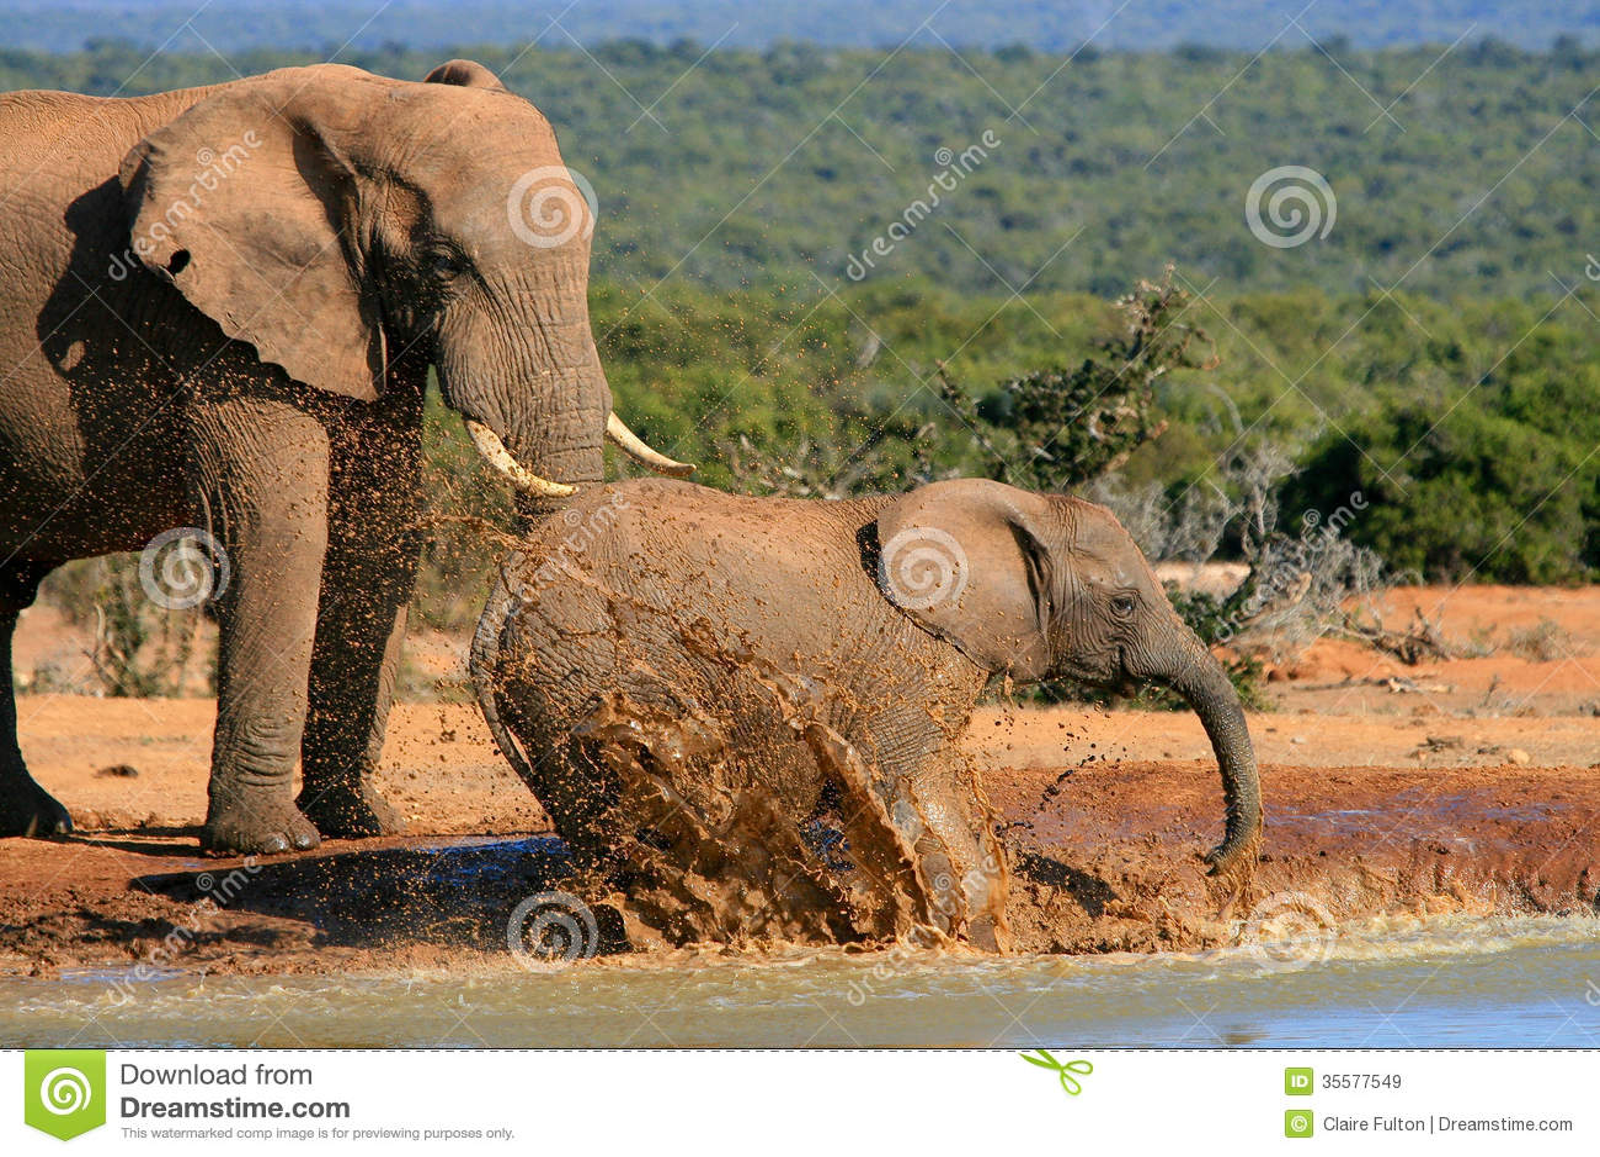 Elephants Splashing Water Stock Image Image Of Pachyderm